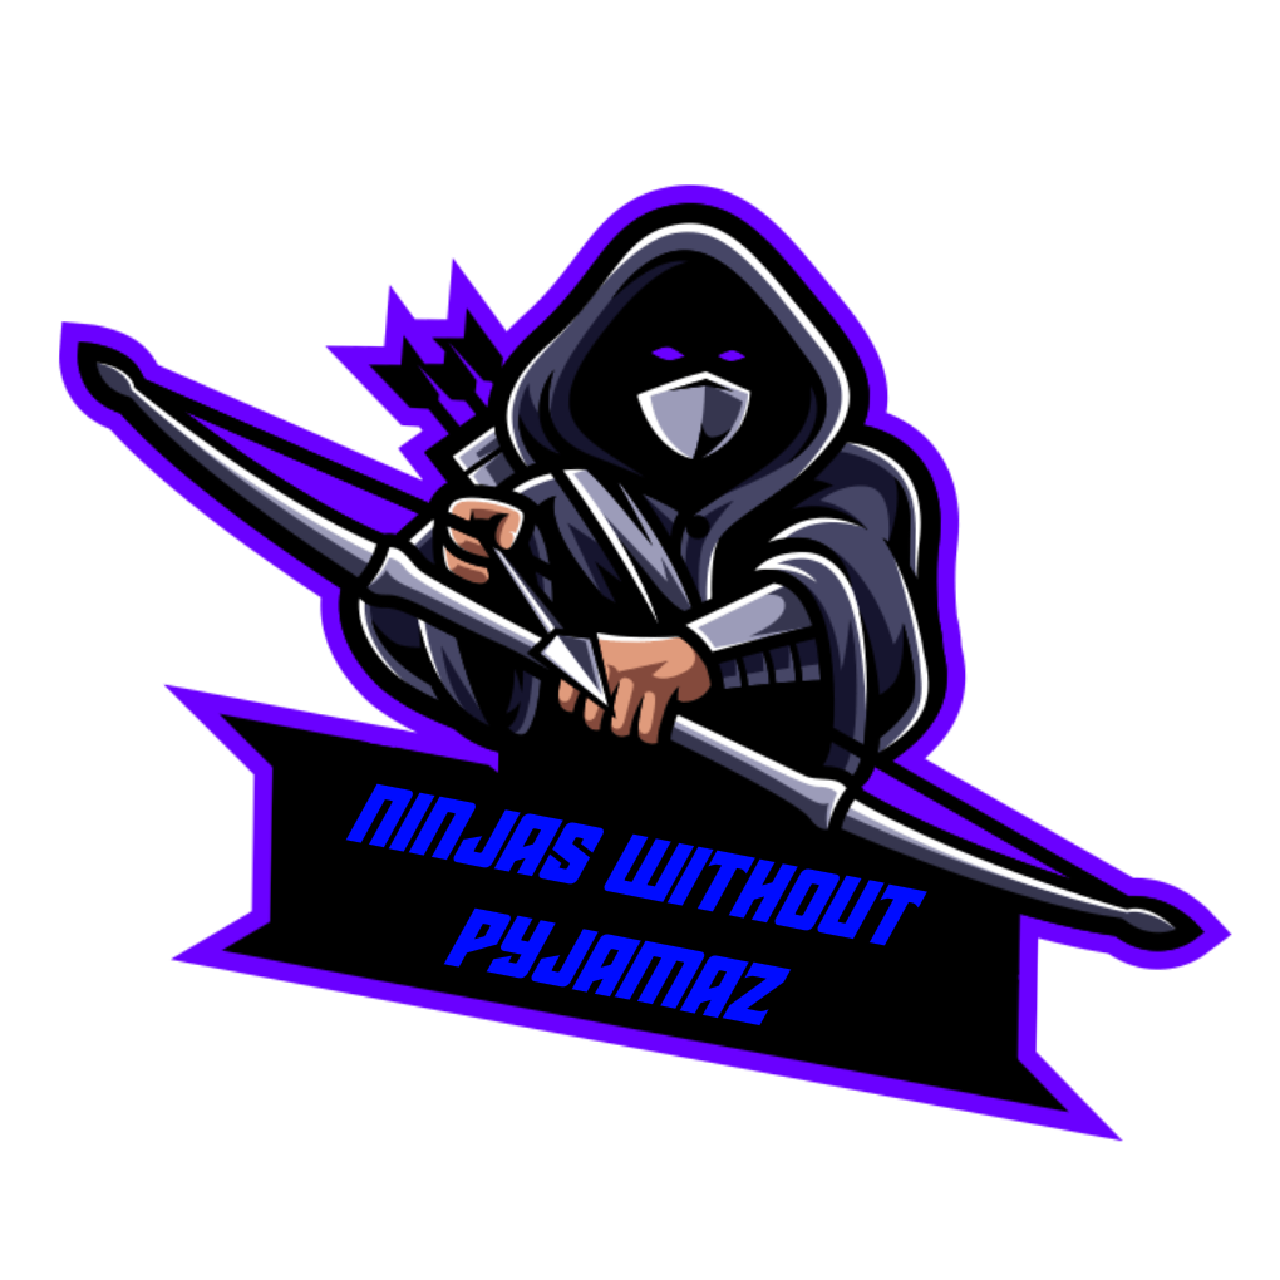 Ninjas without PJ's